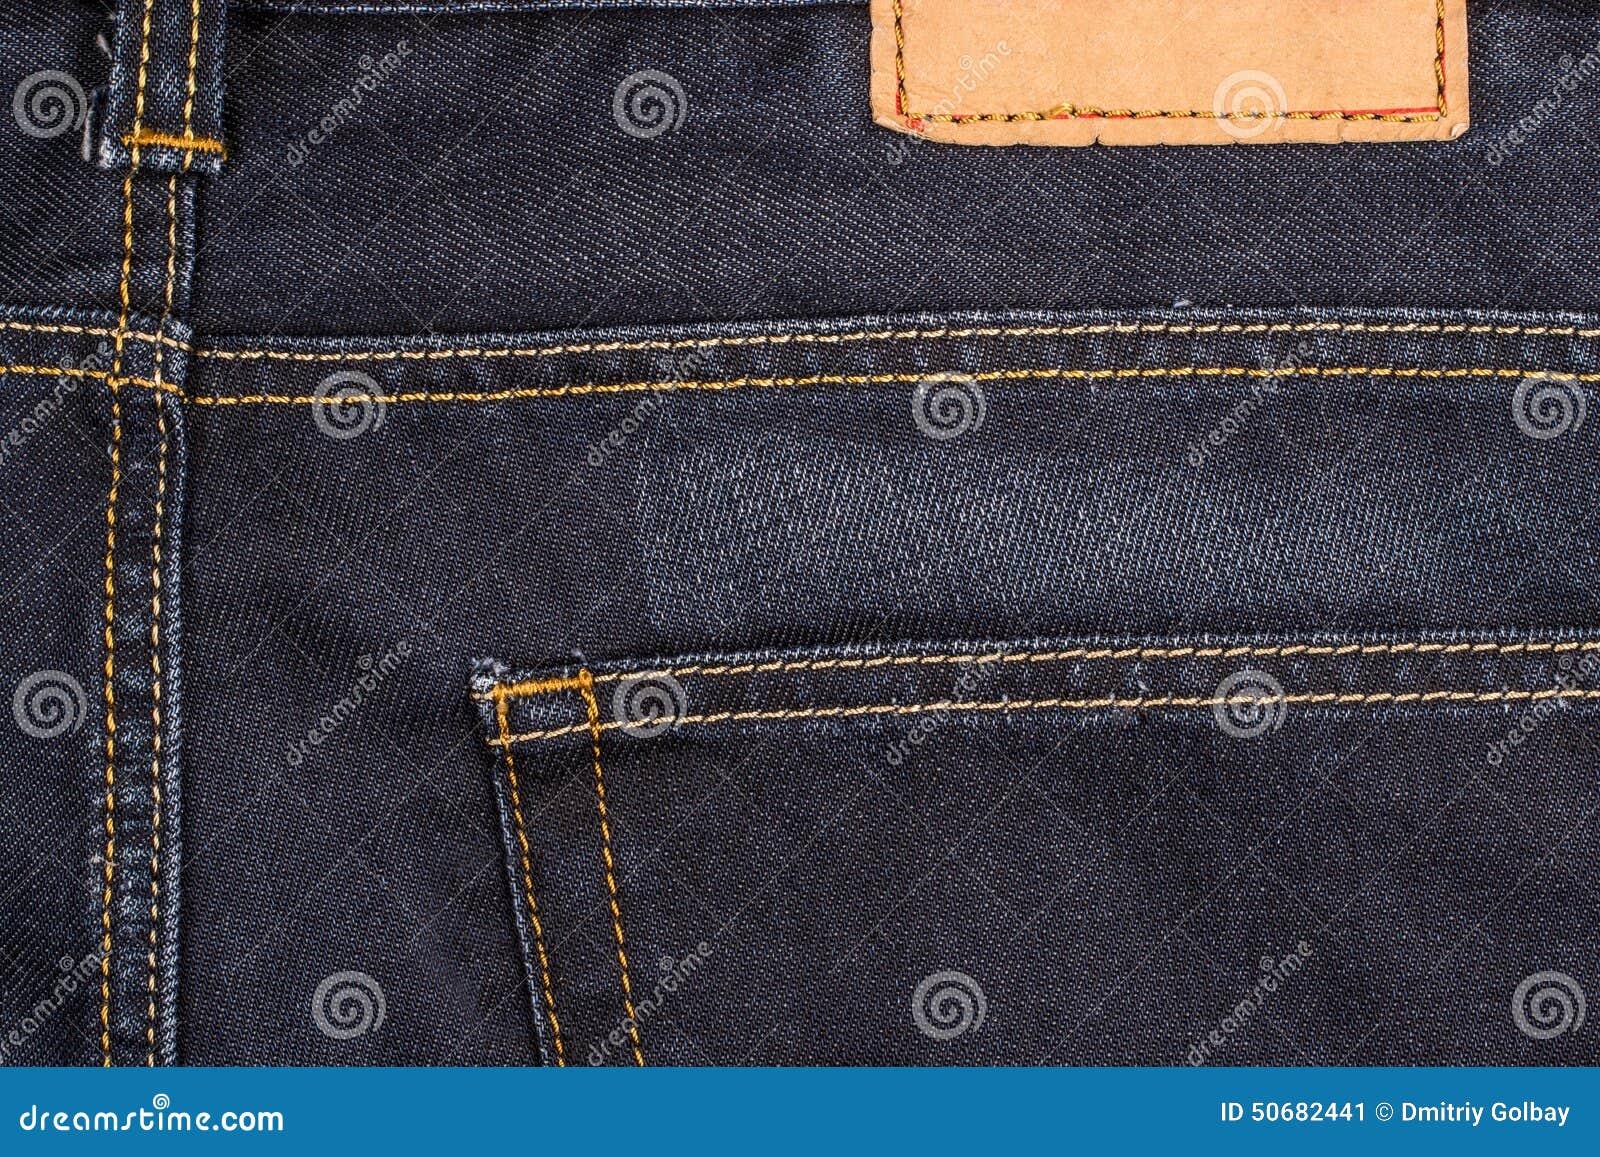 Download 精密背景的蓝色牛仔裤 库存图片. 图片 包括有 靛蓝, 偶然, 牛仔裤, 画布, 颜色, 图象, 布料, 织品 - 50682441